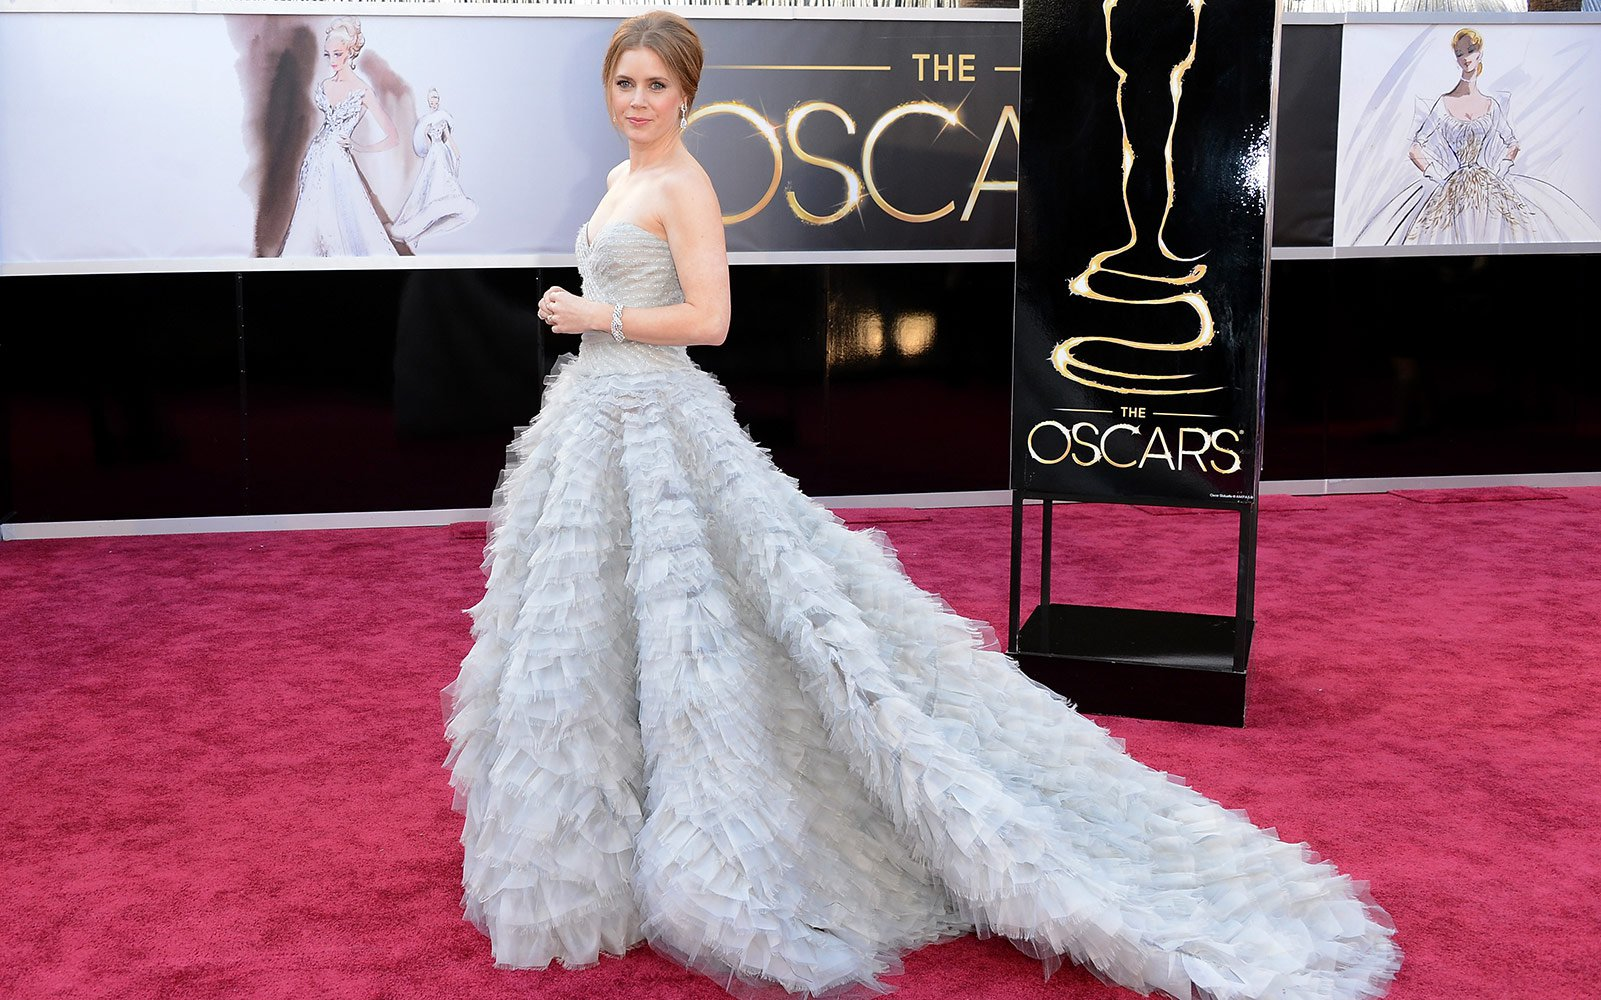 Image via Parade, Amy Adams at the Oscars